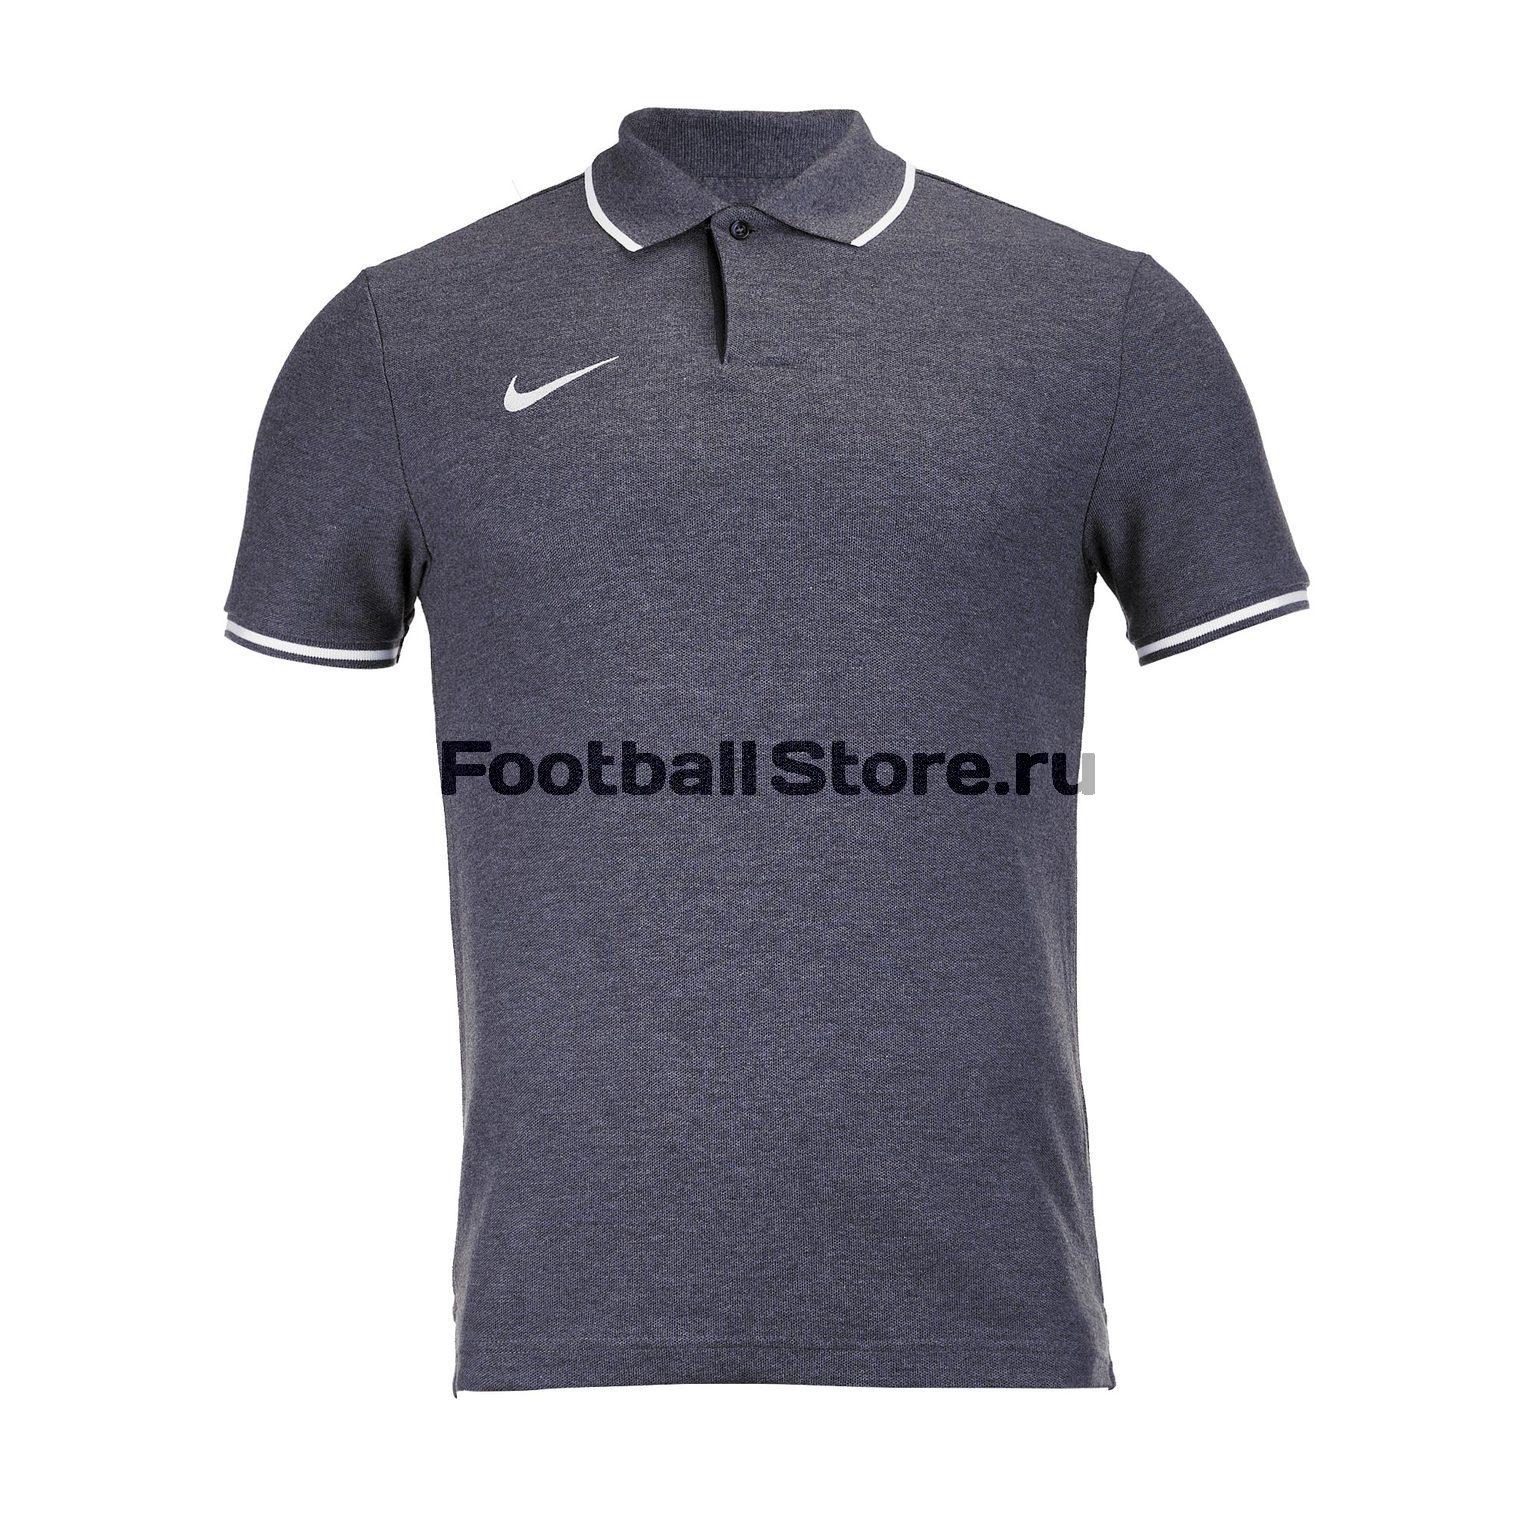 Поло Nike M Polo Club19 SS AJ1502-071 футболка хлопковая nike tee club19 ss aj1504 451